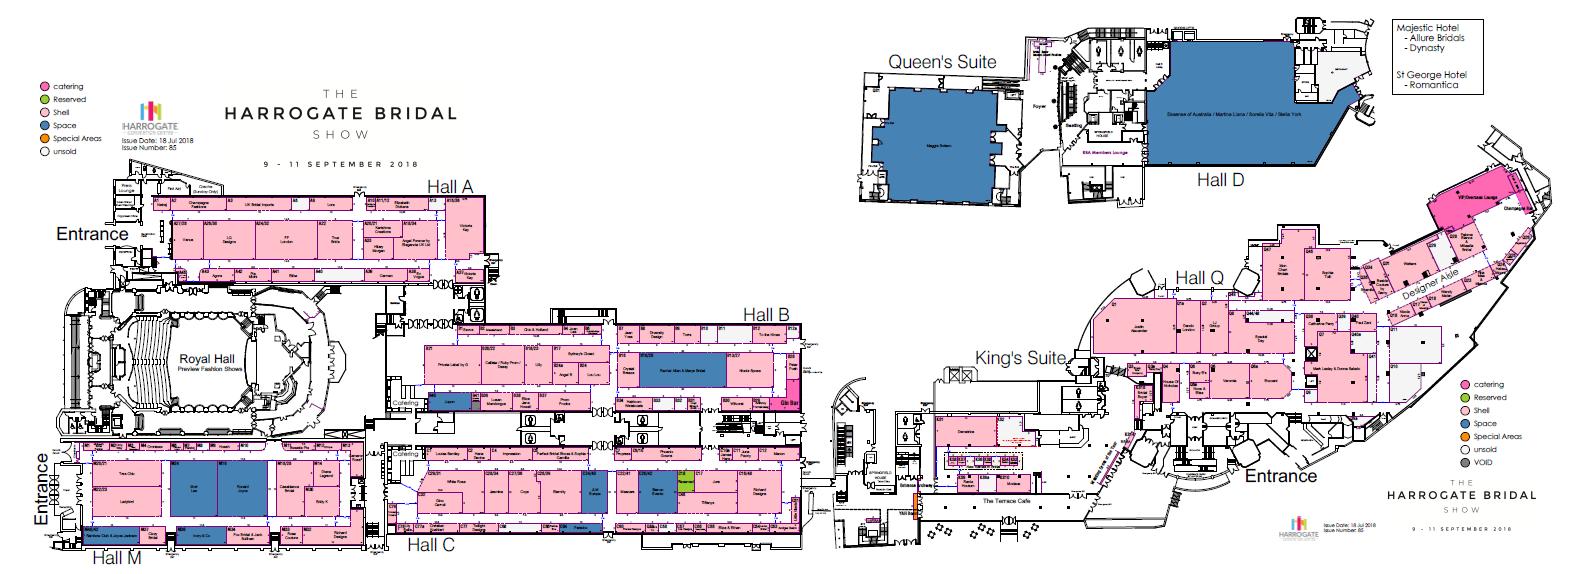 Harrogate Bridal Show floorplan